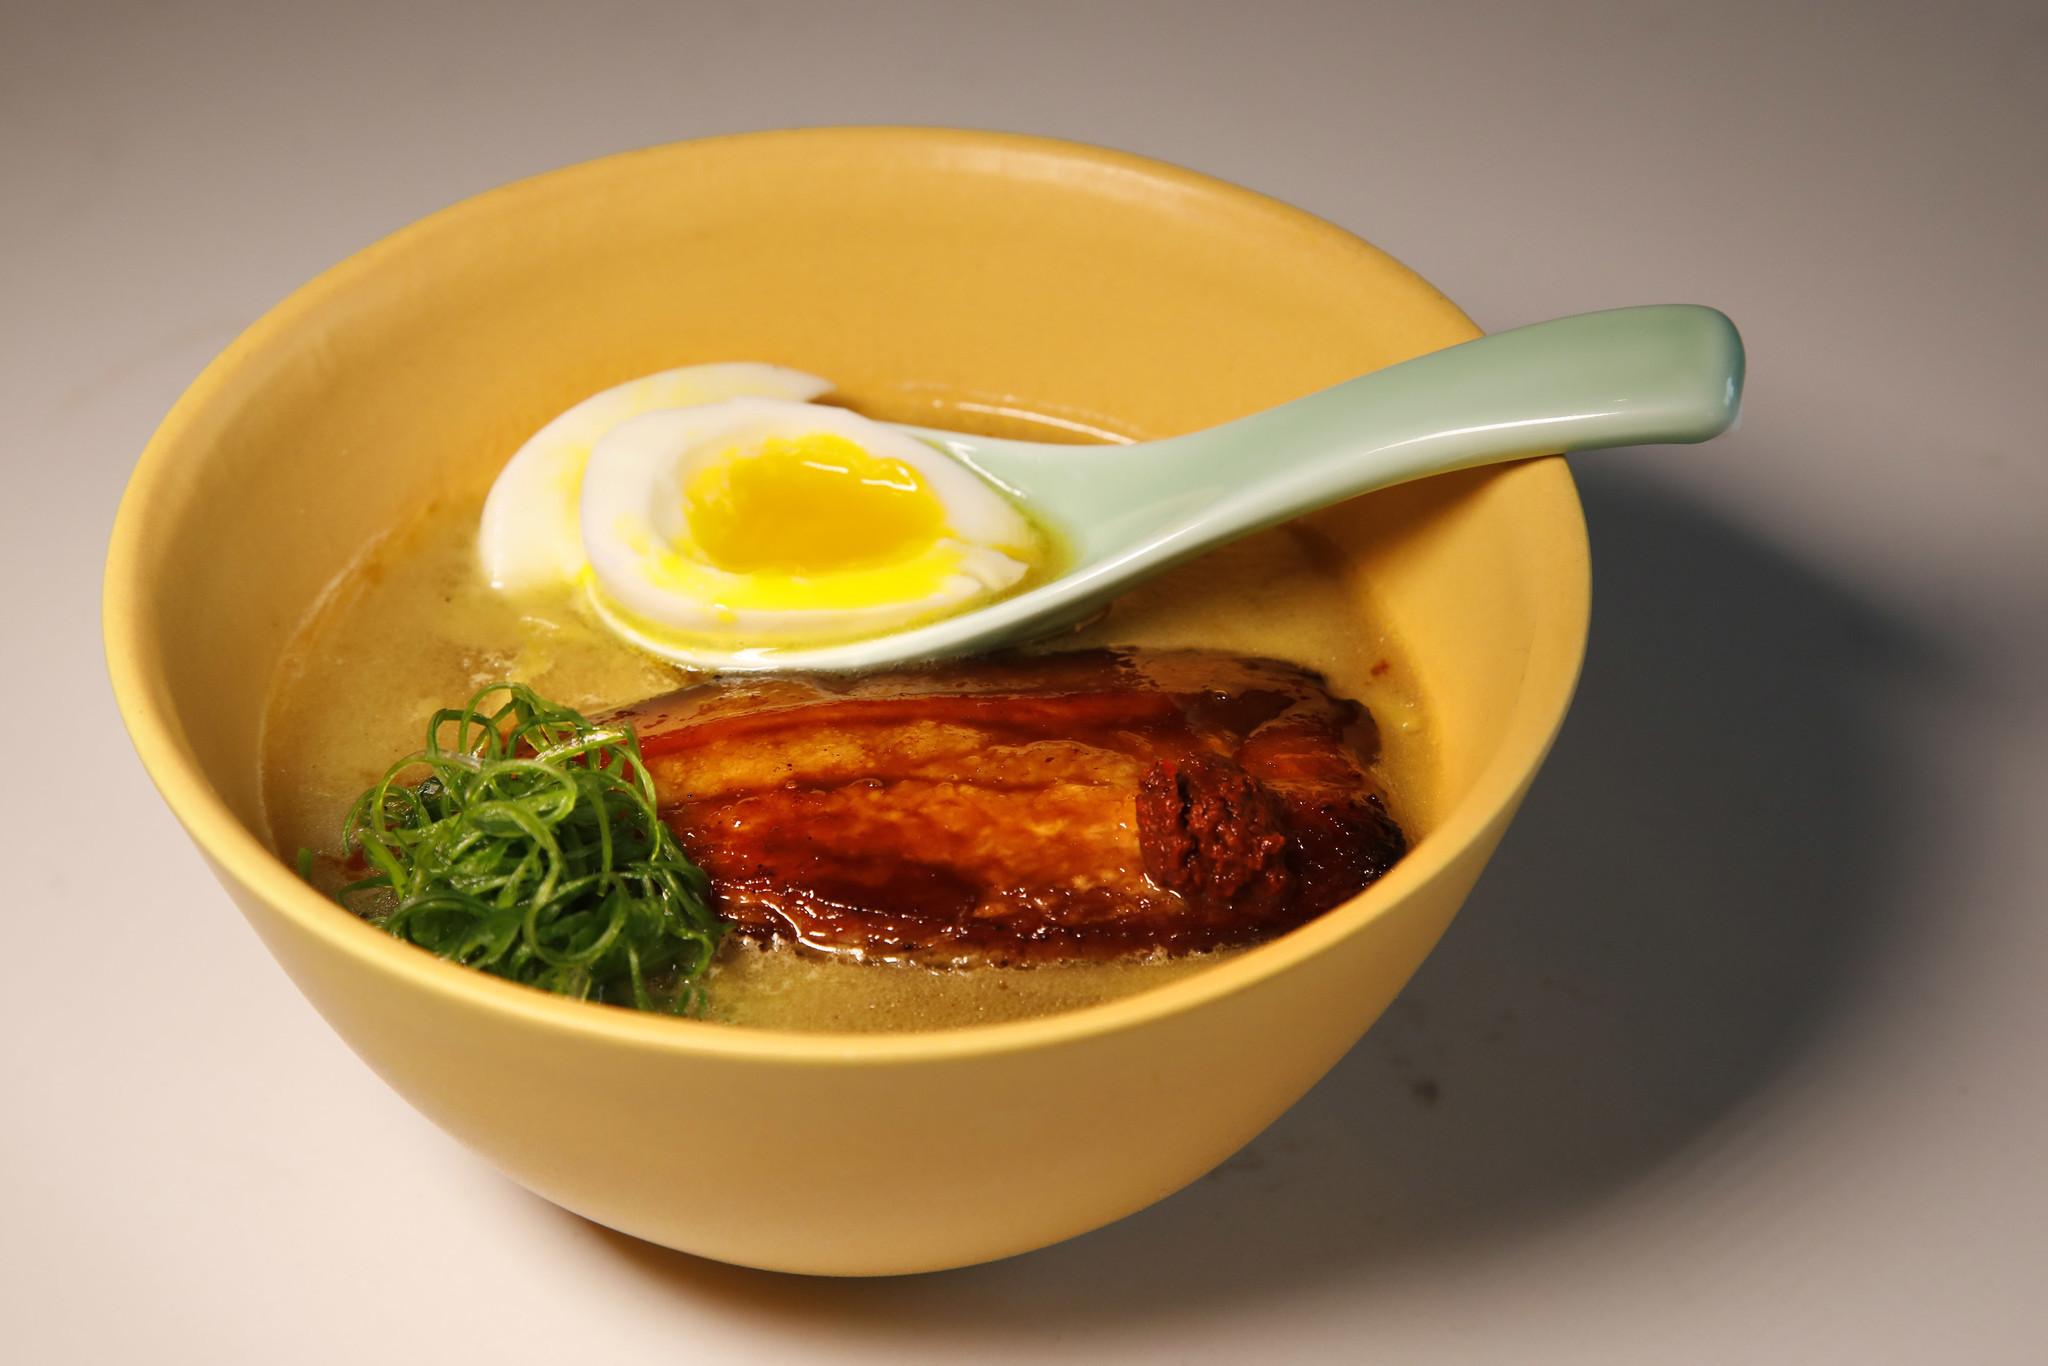 Chef Iliana Regan launches 'Kitsune Kit' meal-delivery service